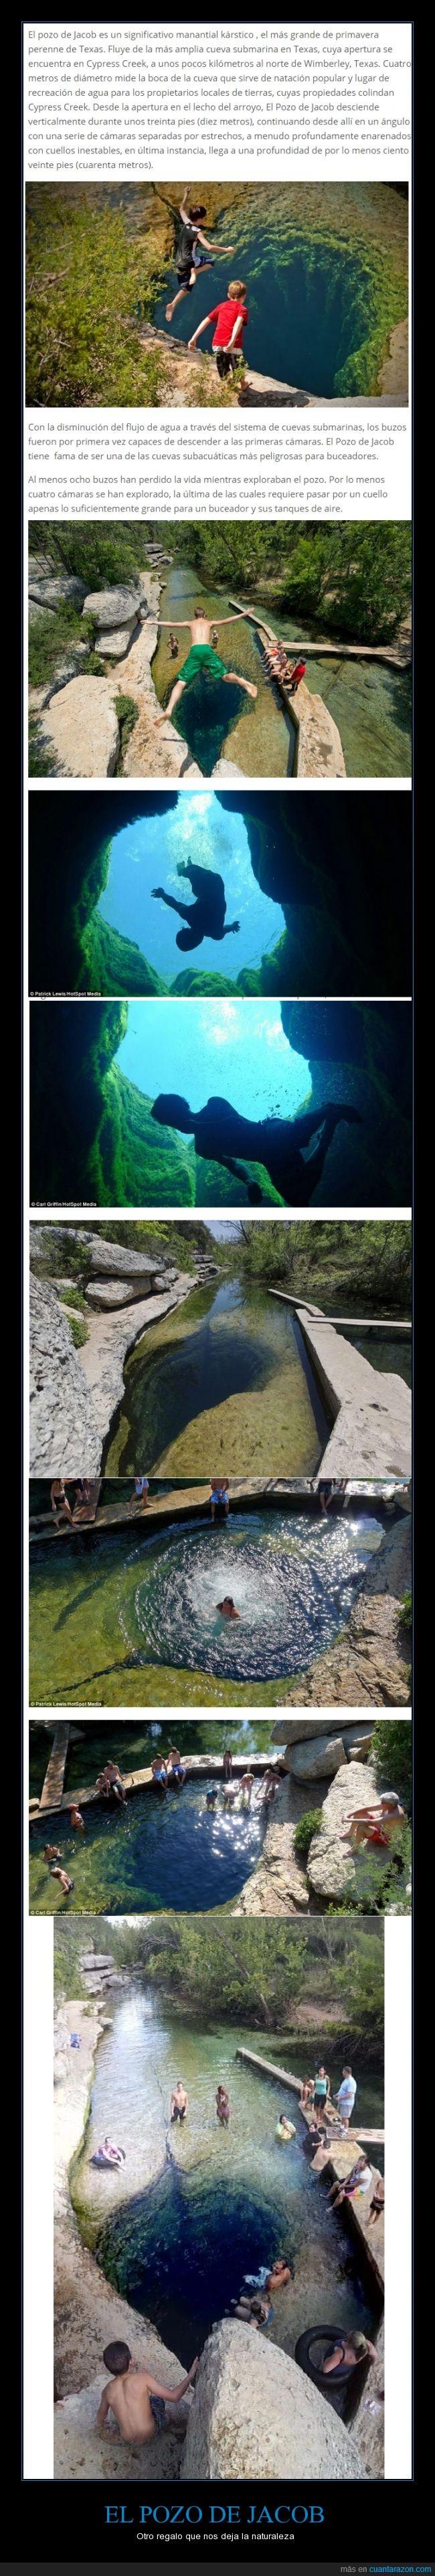 buceador,buzo,cueva,cypress creek,jacob,muerte,piscina,pozo,subacuatica,Texas